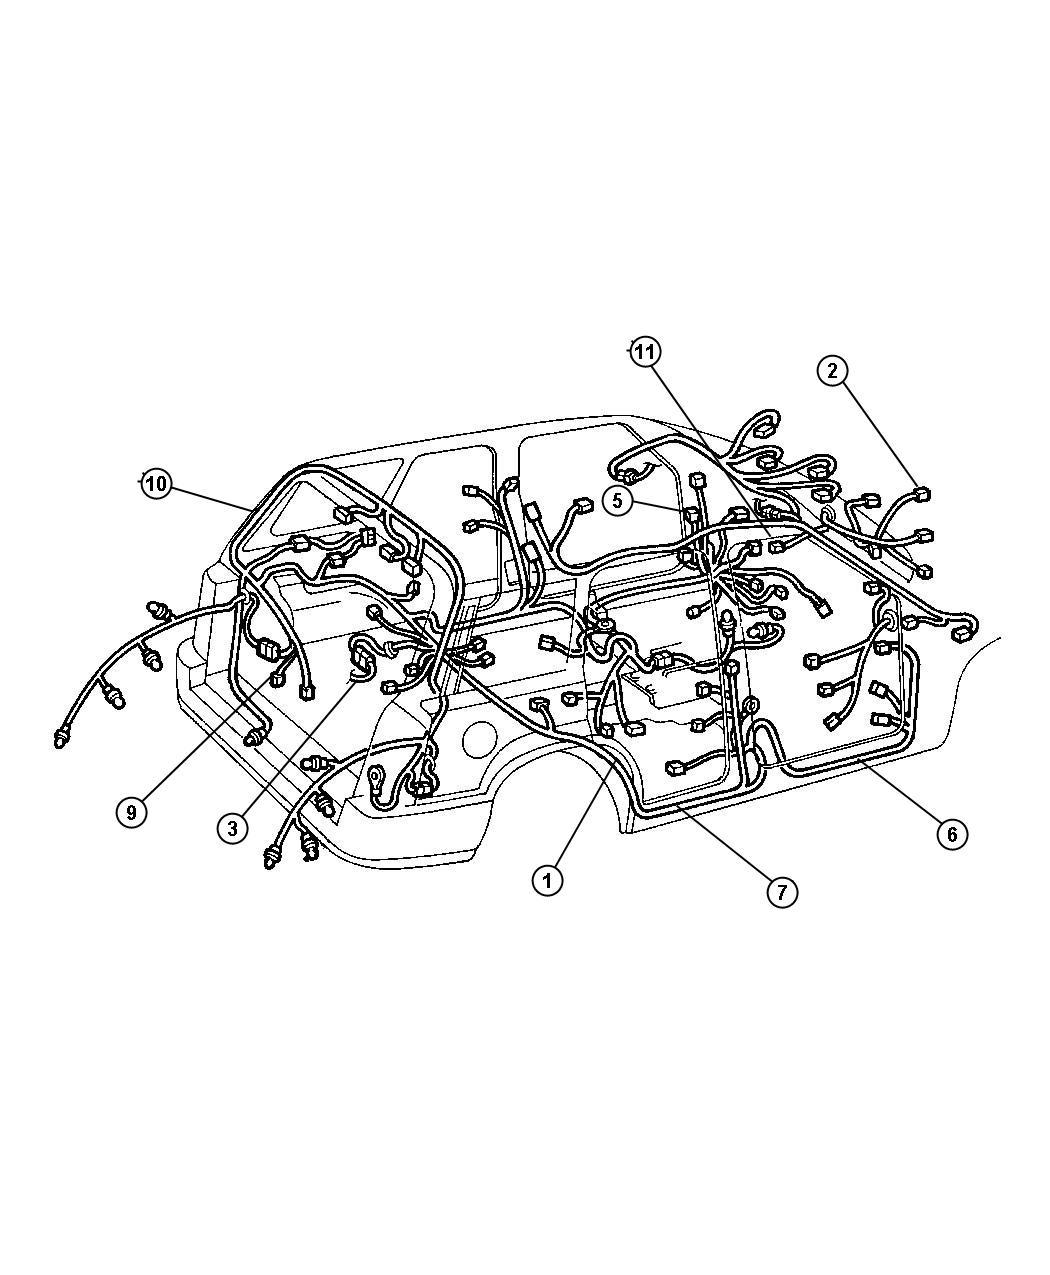 2008 Jeep Liberty Wiring Diagram / 2008 Jeep Wrangler Fuse